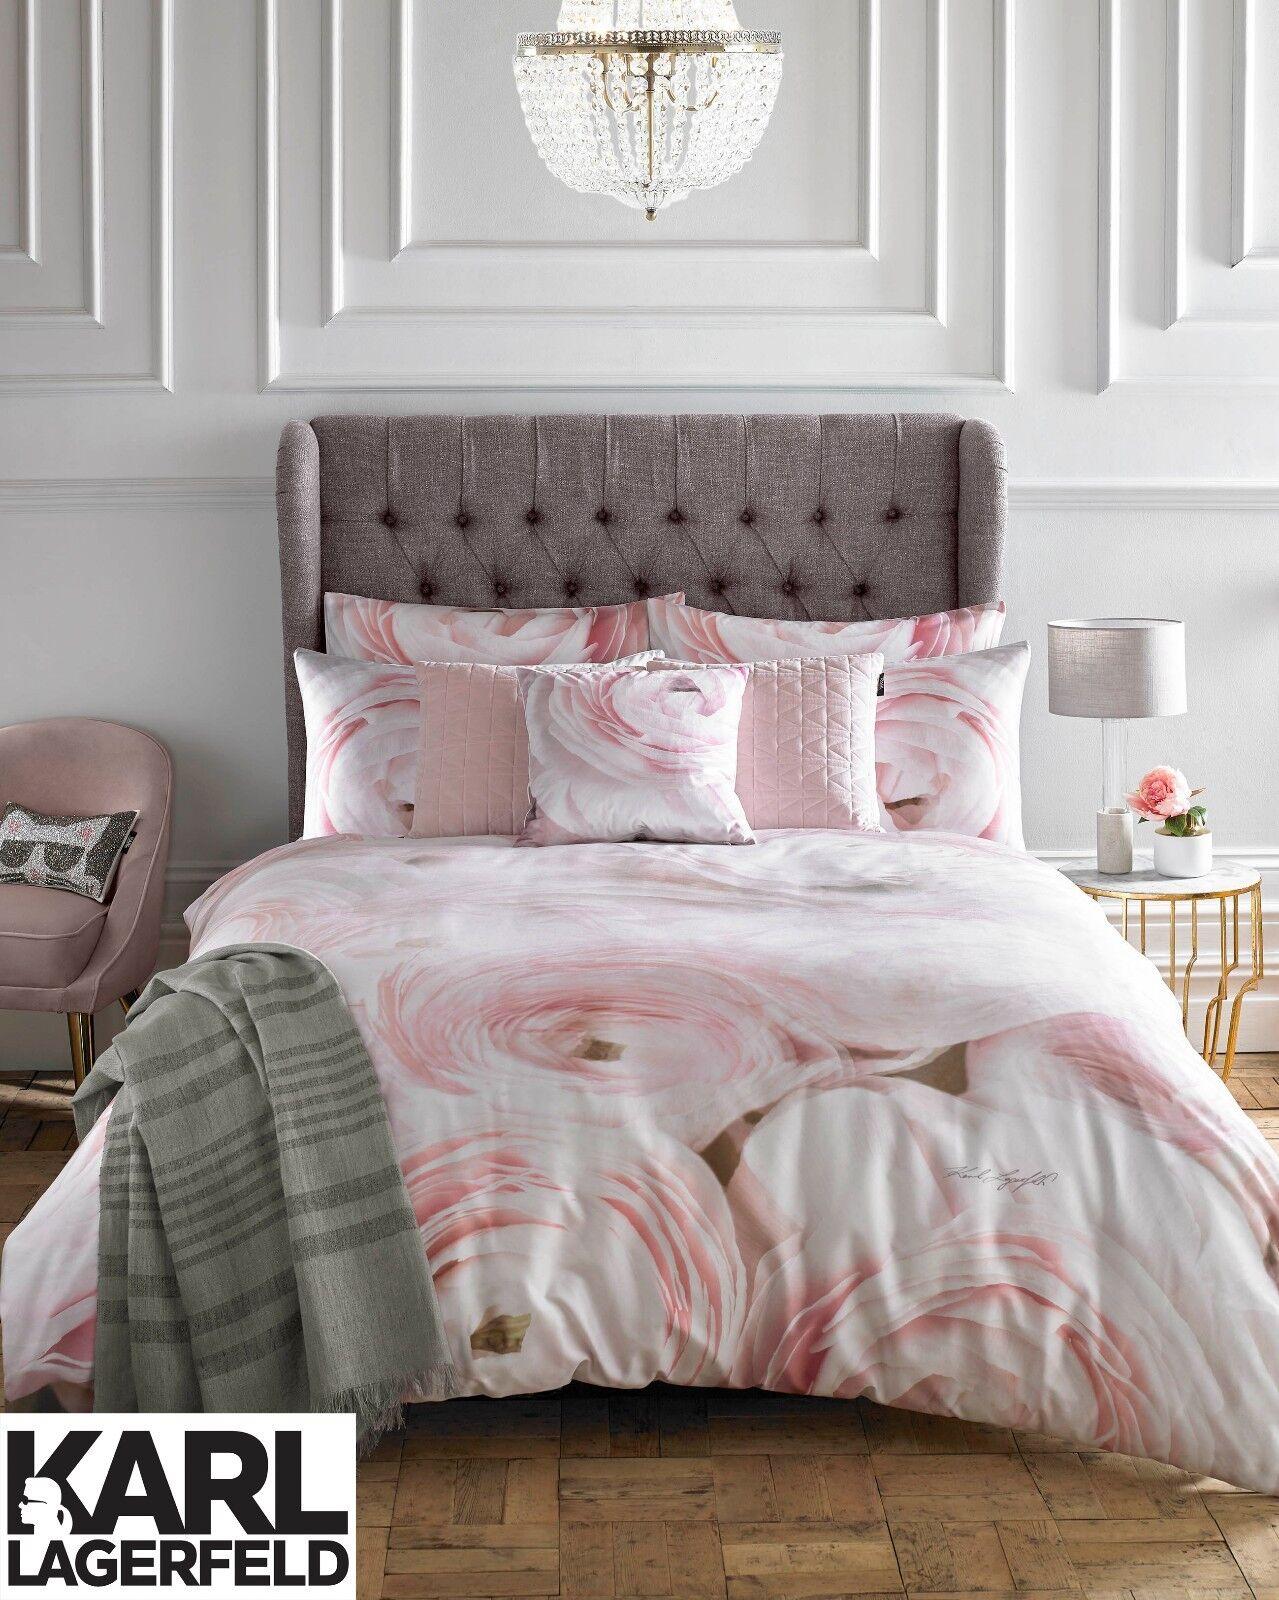 Karl Lagerfeld Designer RANA pink Floral Printed 100% Cotton Bedding Bed Linen